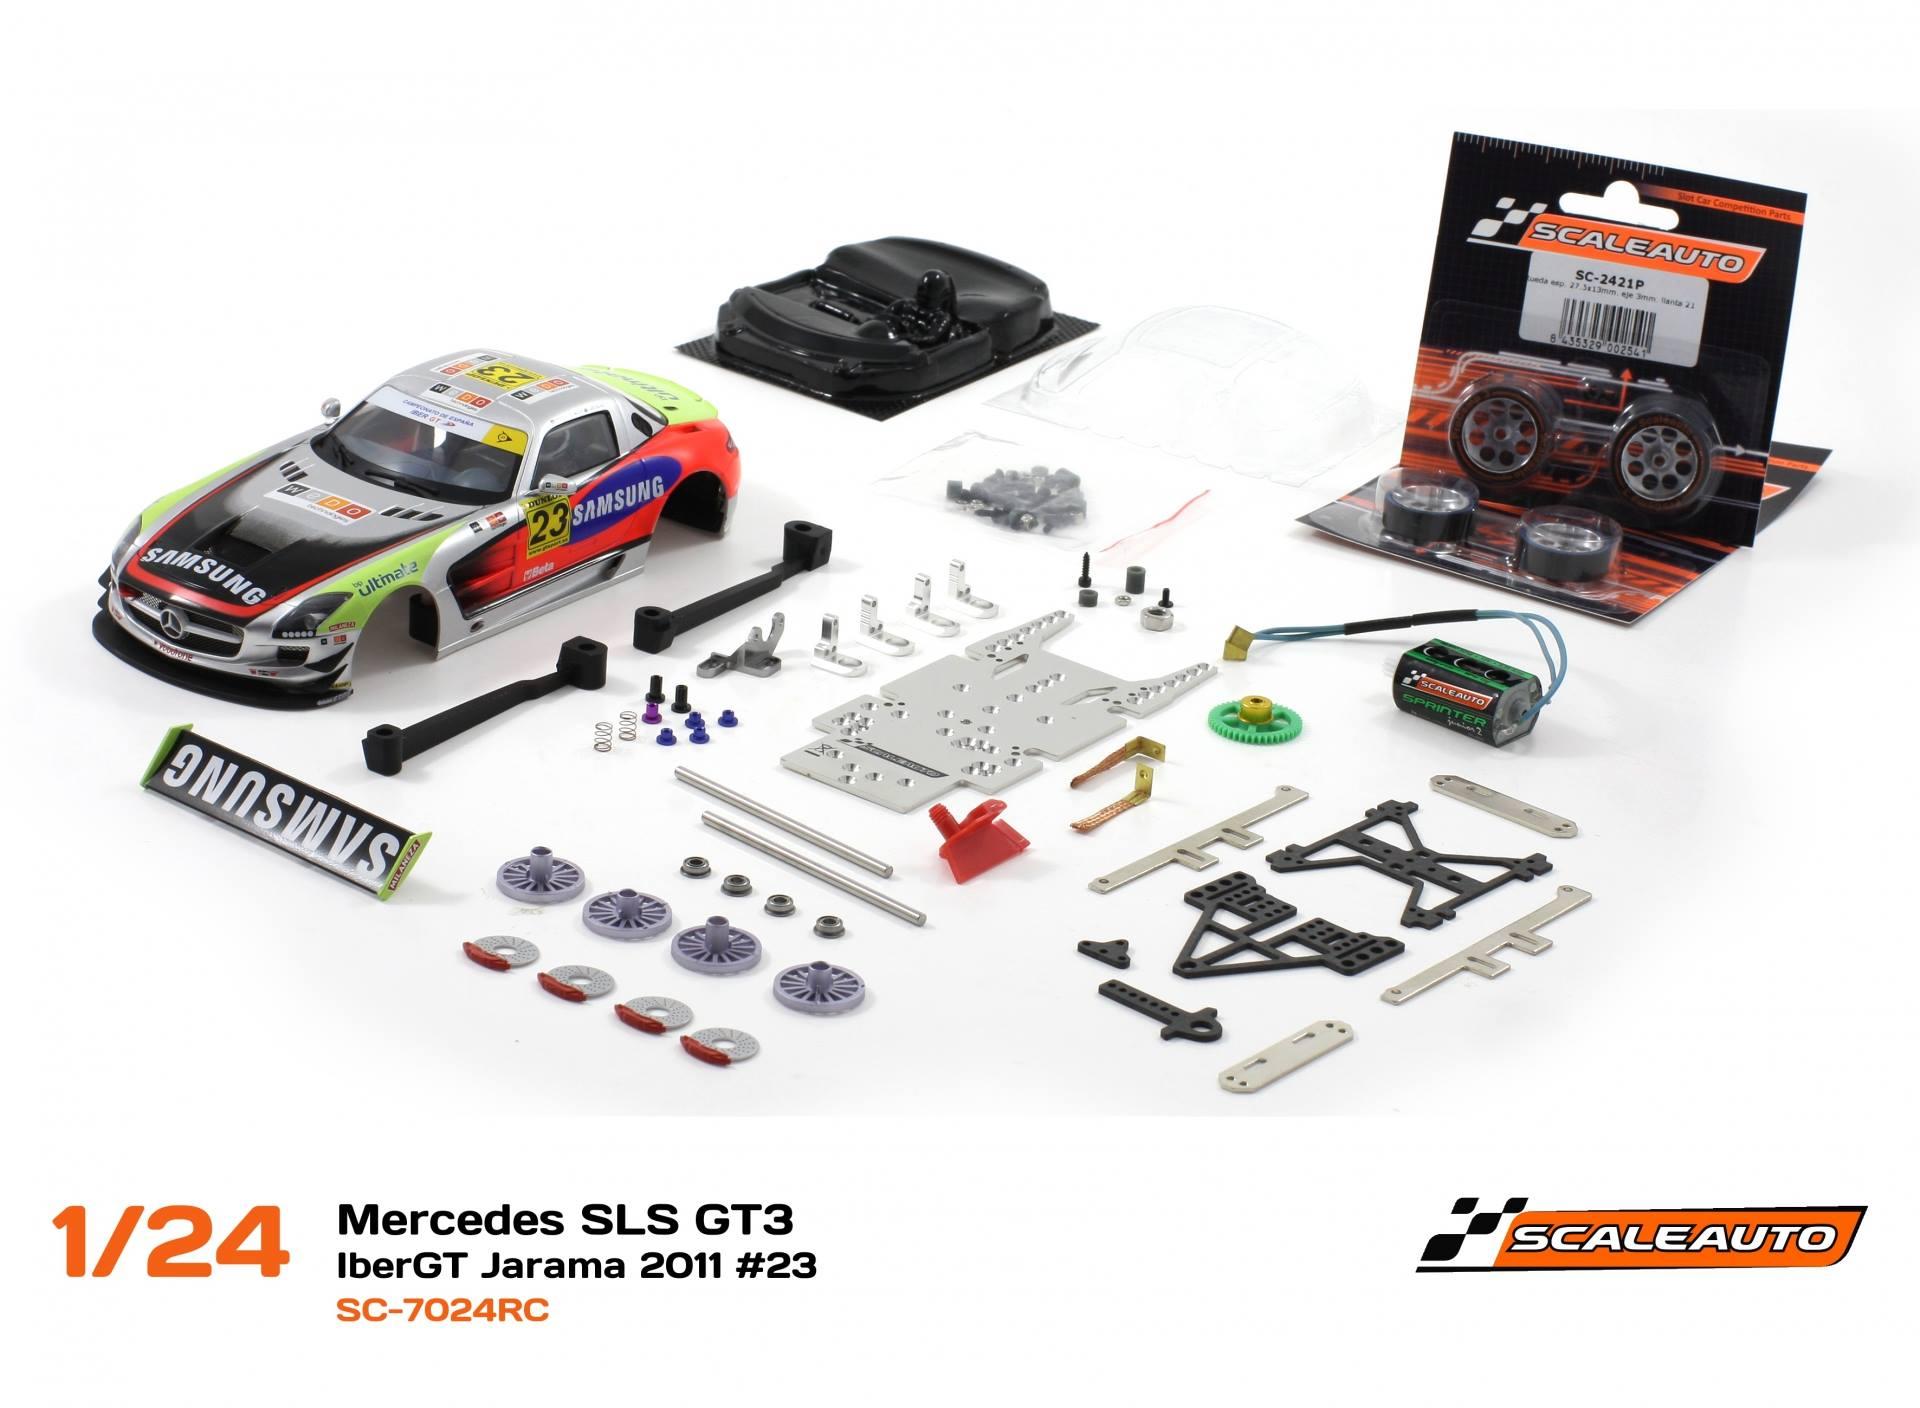 Mercedes SLS GT3 – Iber GT Jarama 2011 #23 – SC-702eRC